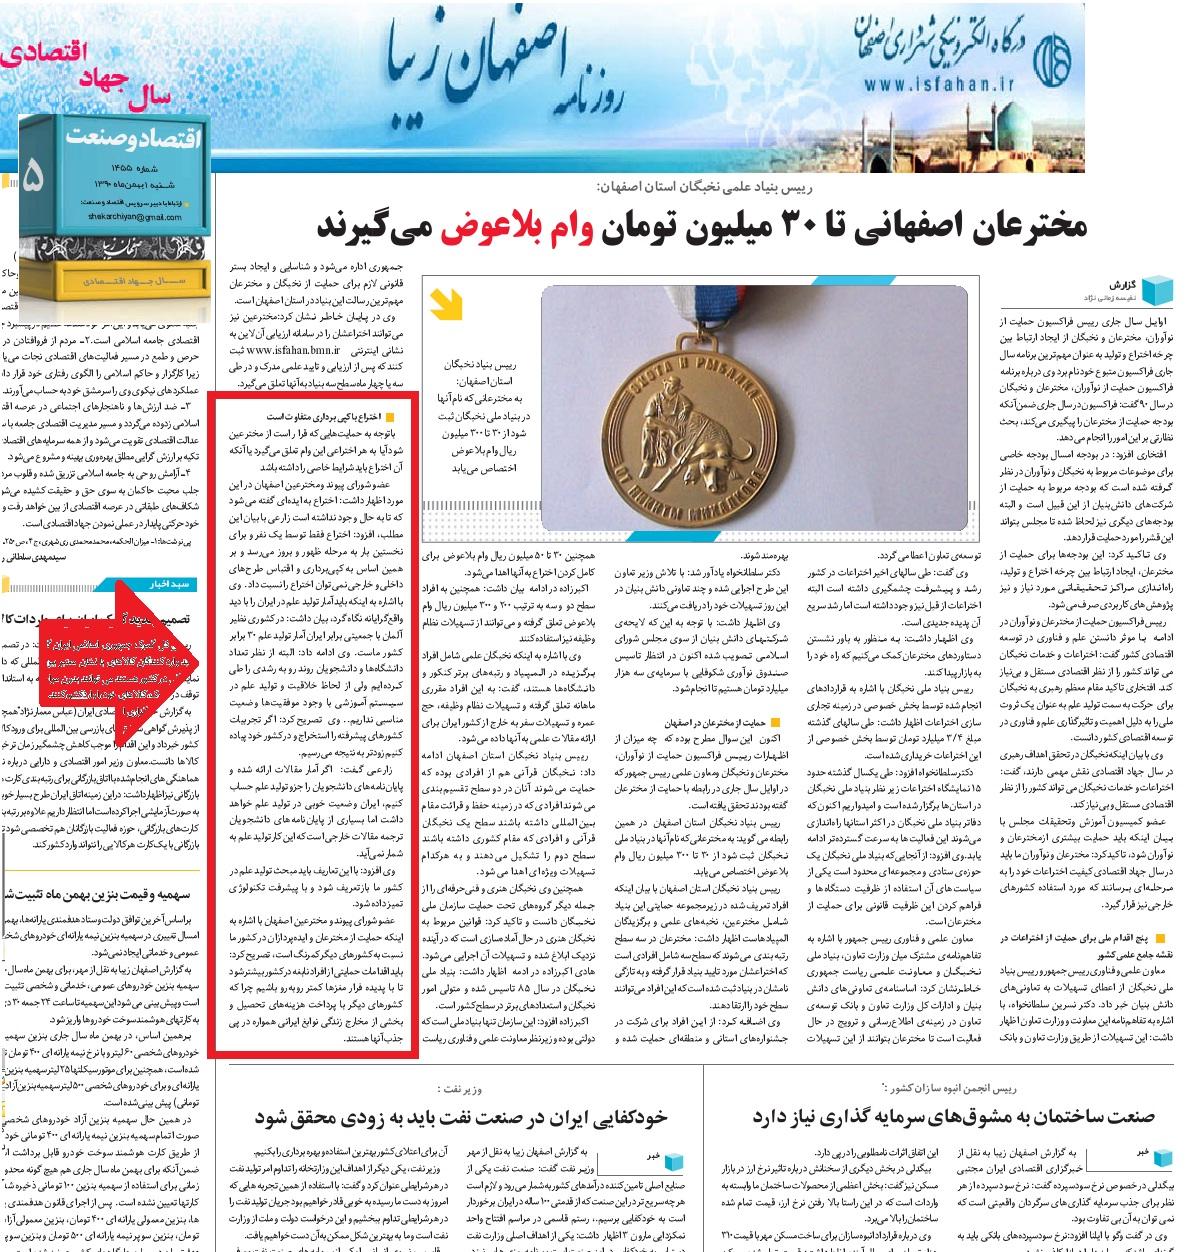 http://www.n-javan.com/khabargozariha/esfahanziba-nokhbagan.jpg